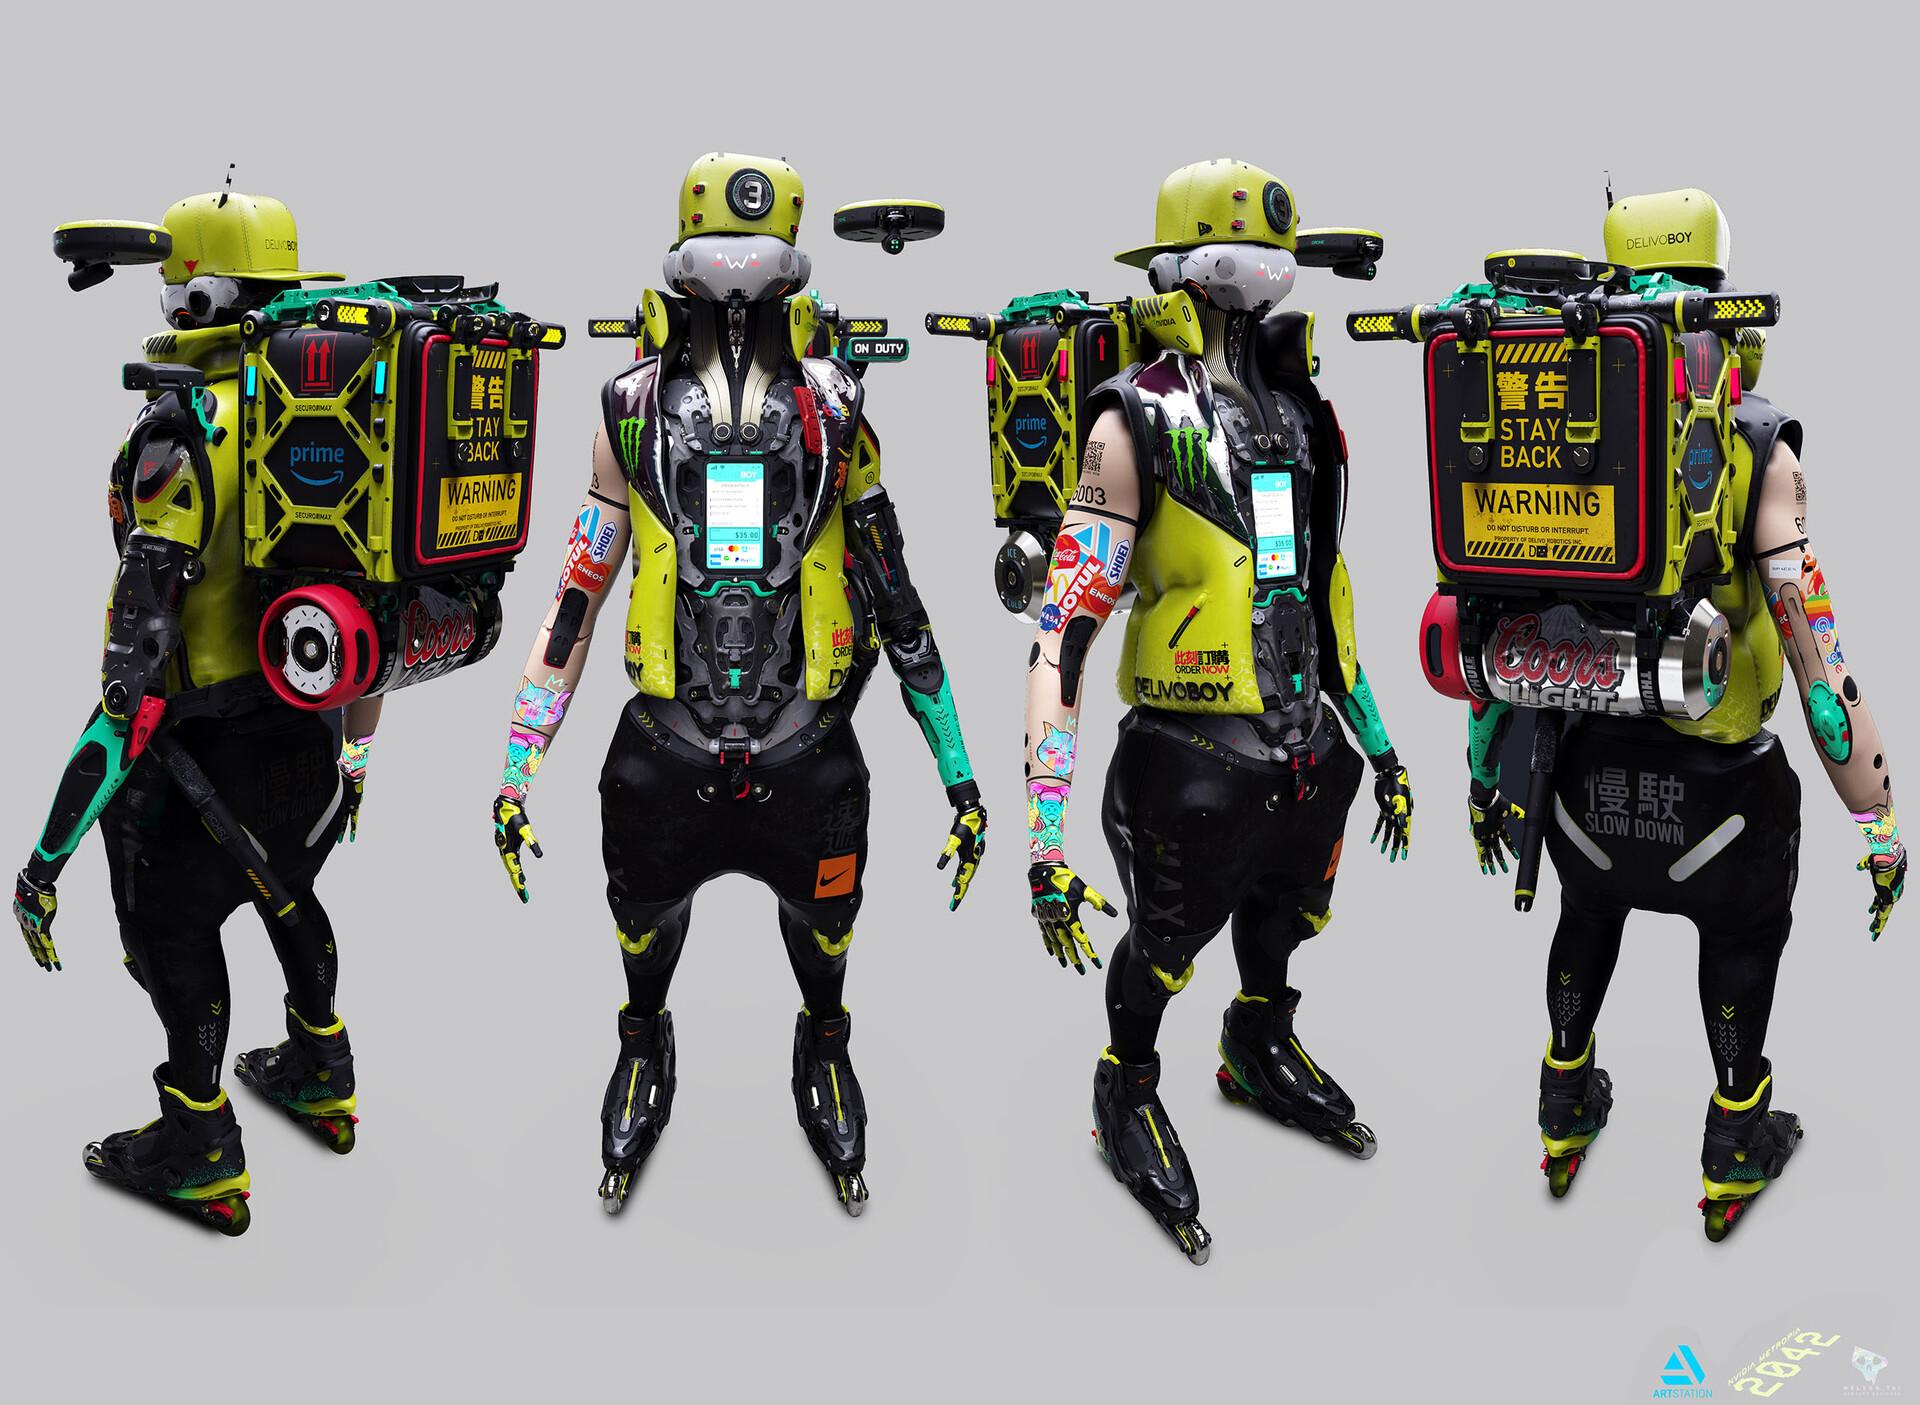 DelivoBoy character design